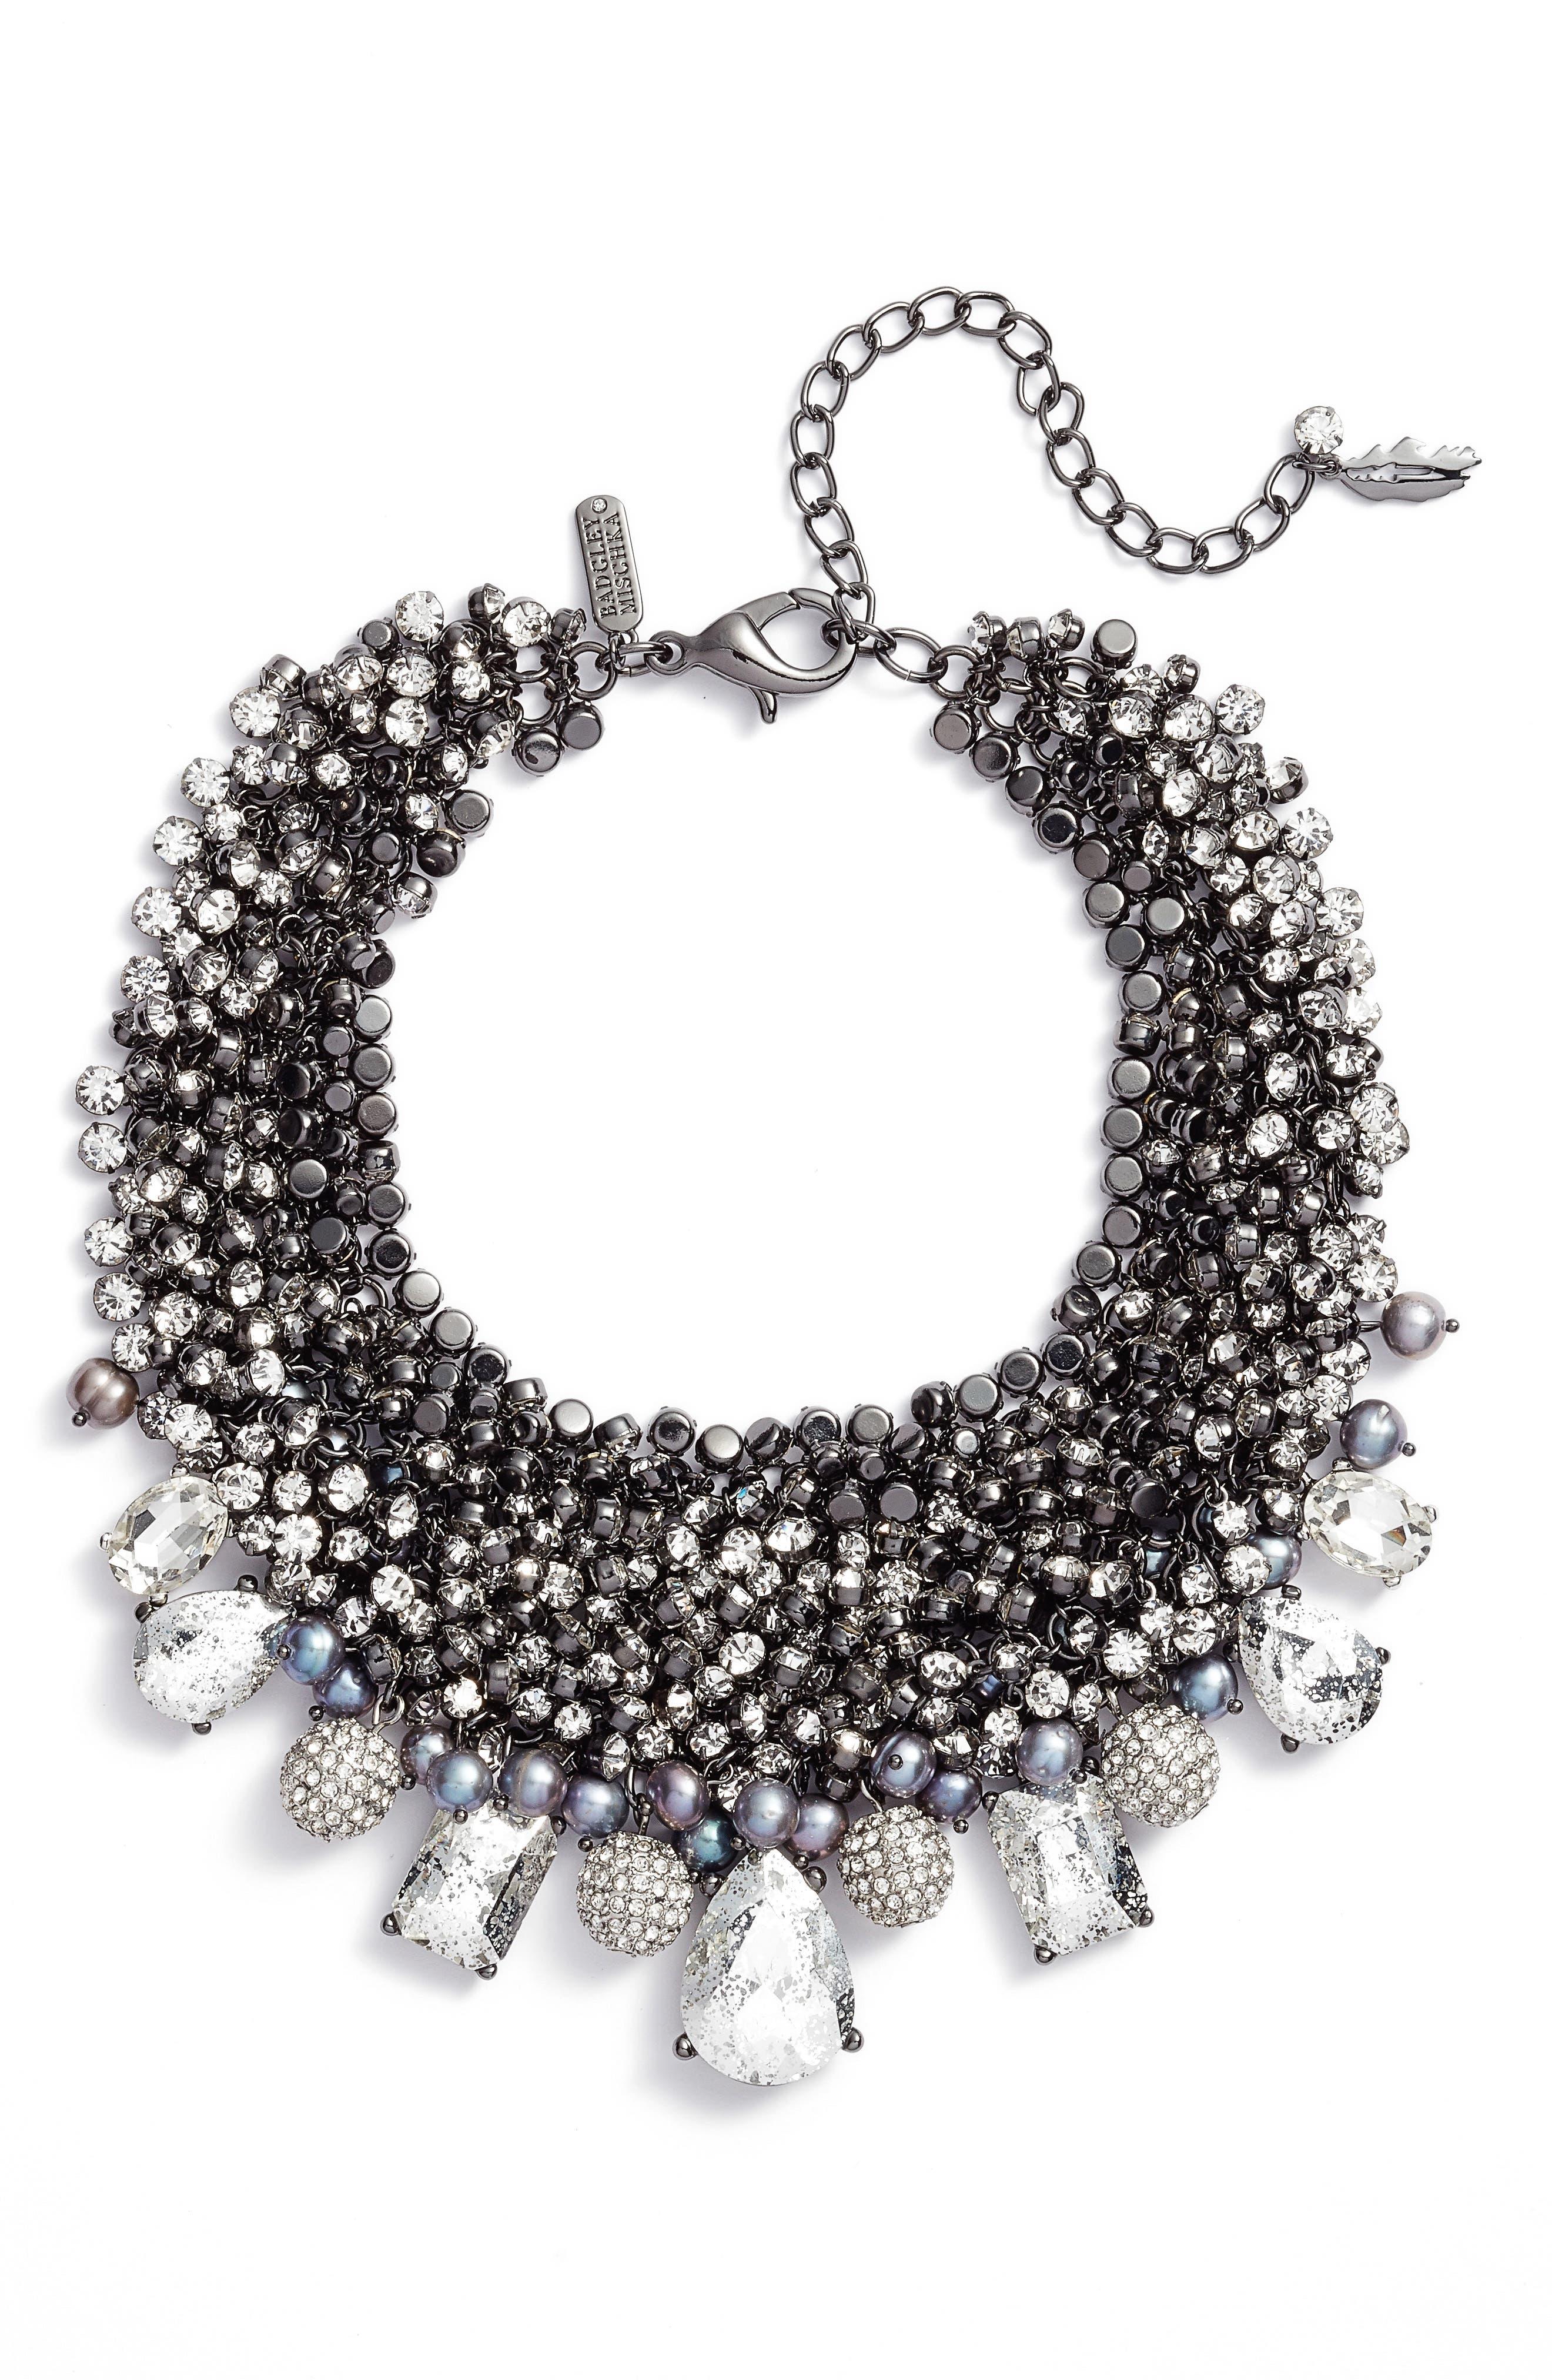 Badgley Mischka Crystal Cluster Necklace